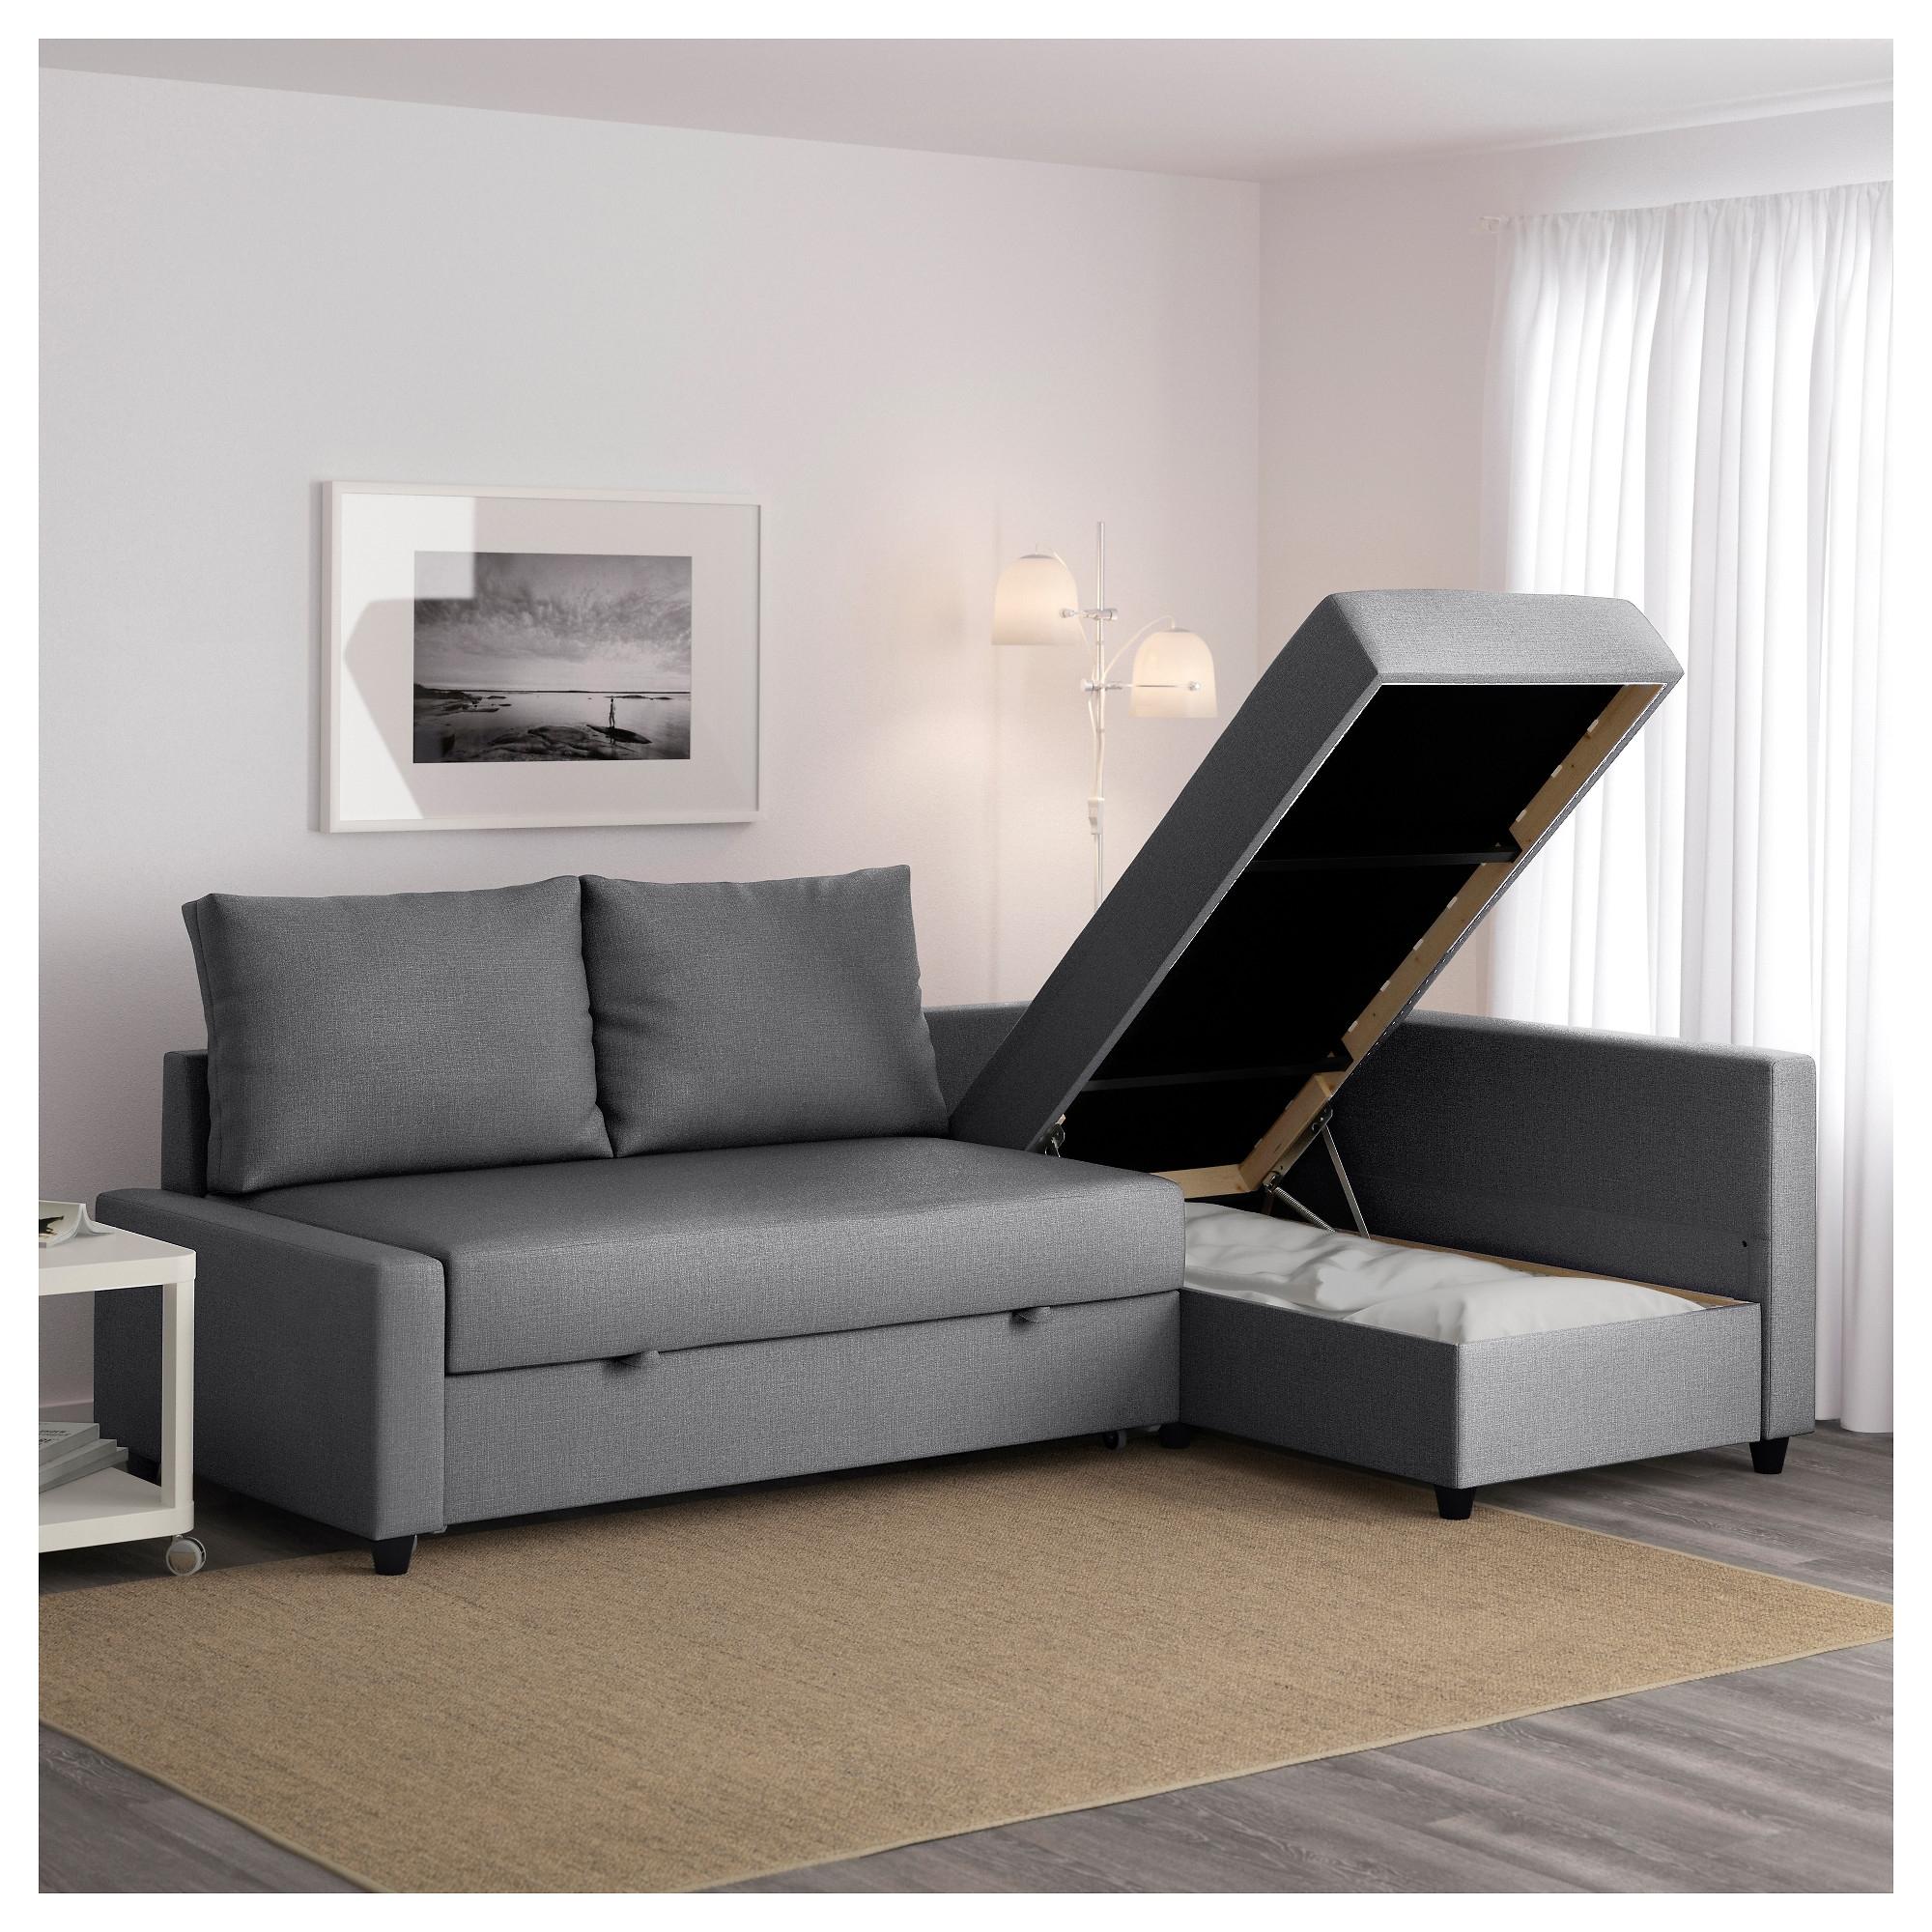 Popular Friheten Corner Sofa Bed With Storage Skiftebo Dark Grey – Ikea With Regard To Chaise Sofa Beds (View 6 of 15)